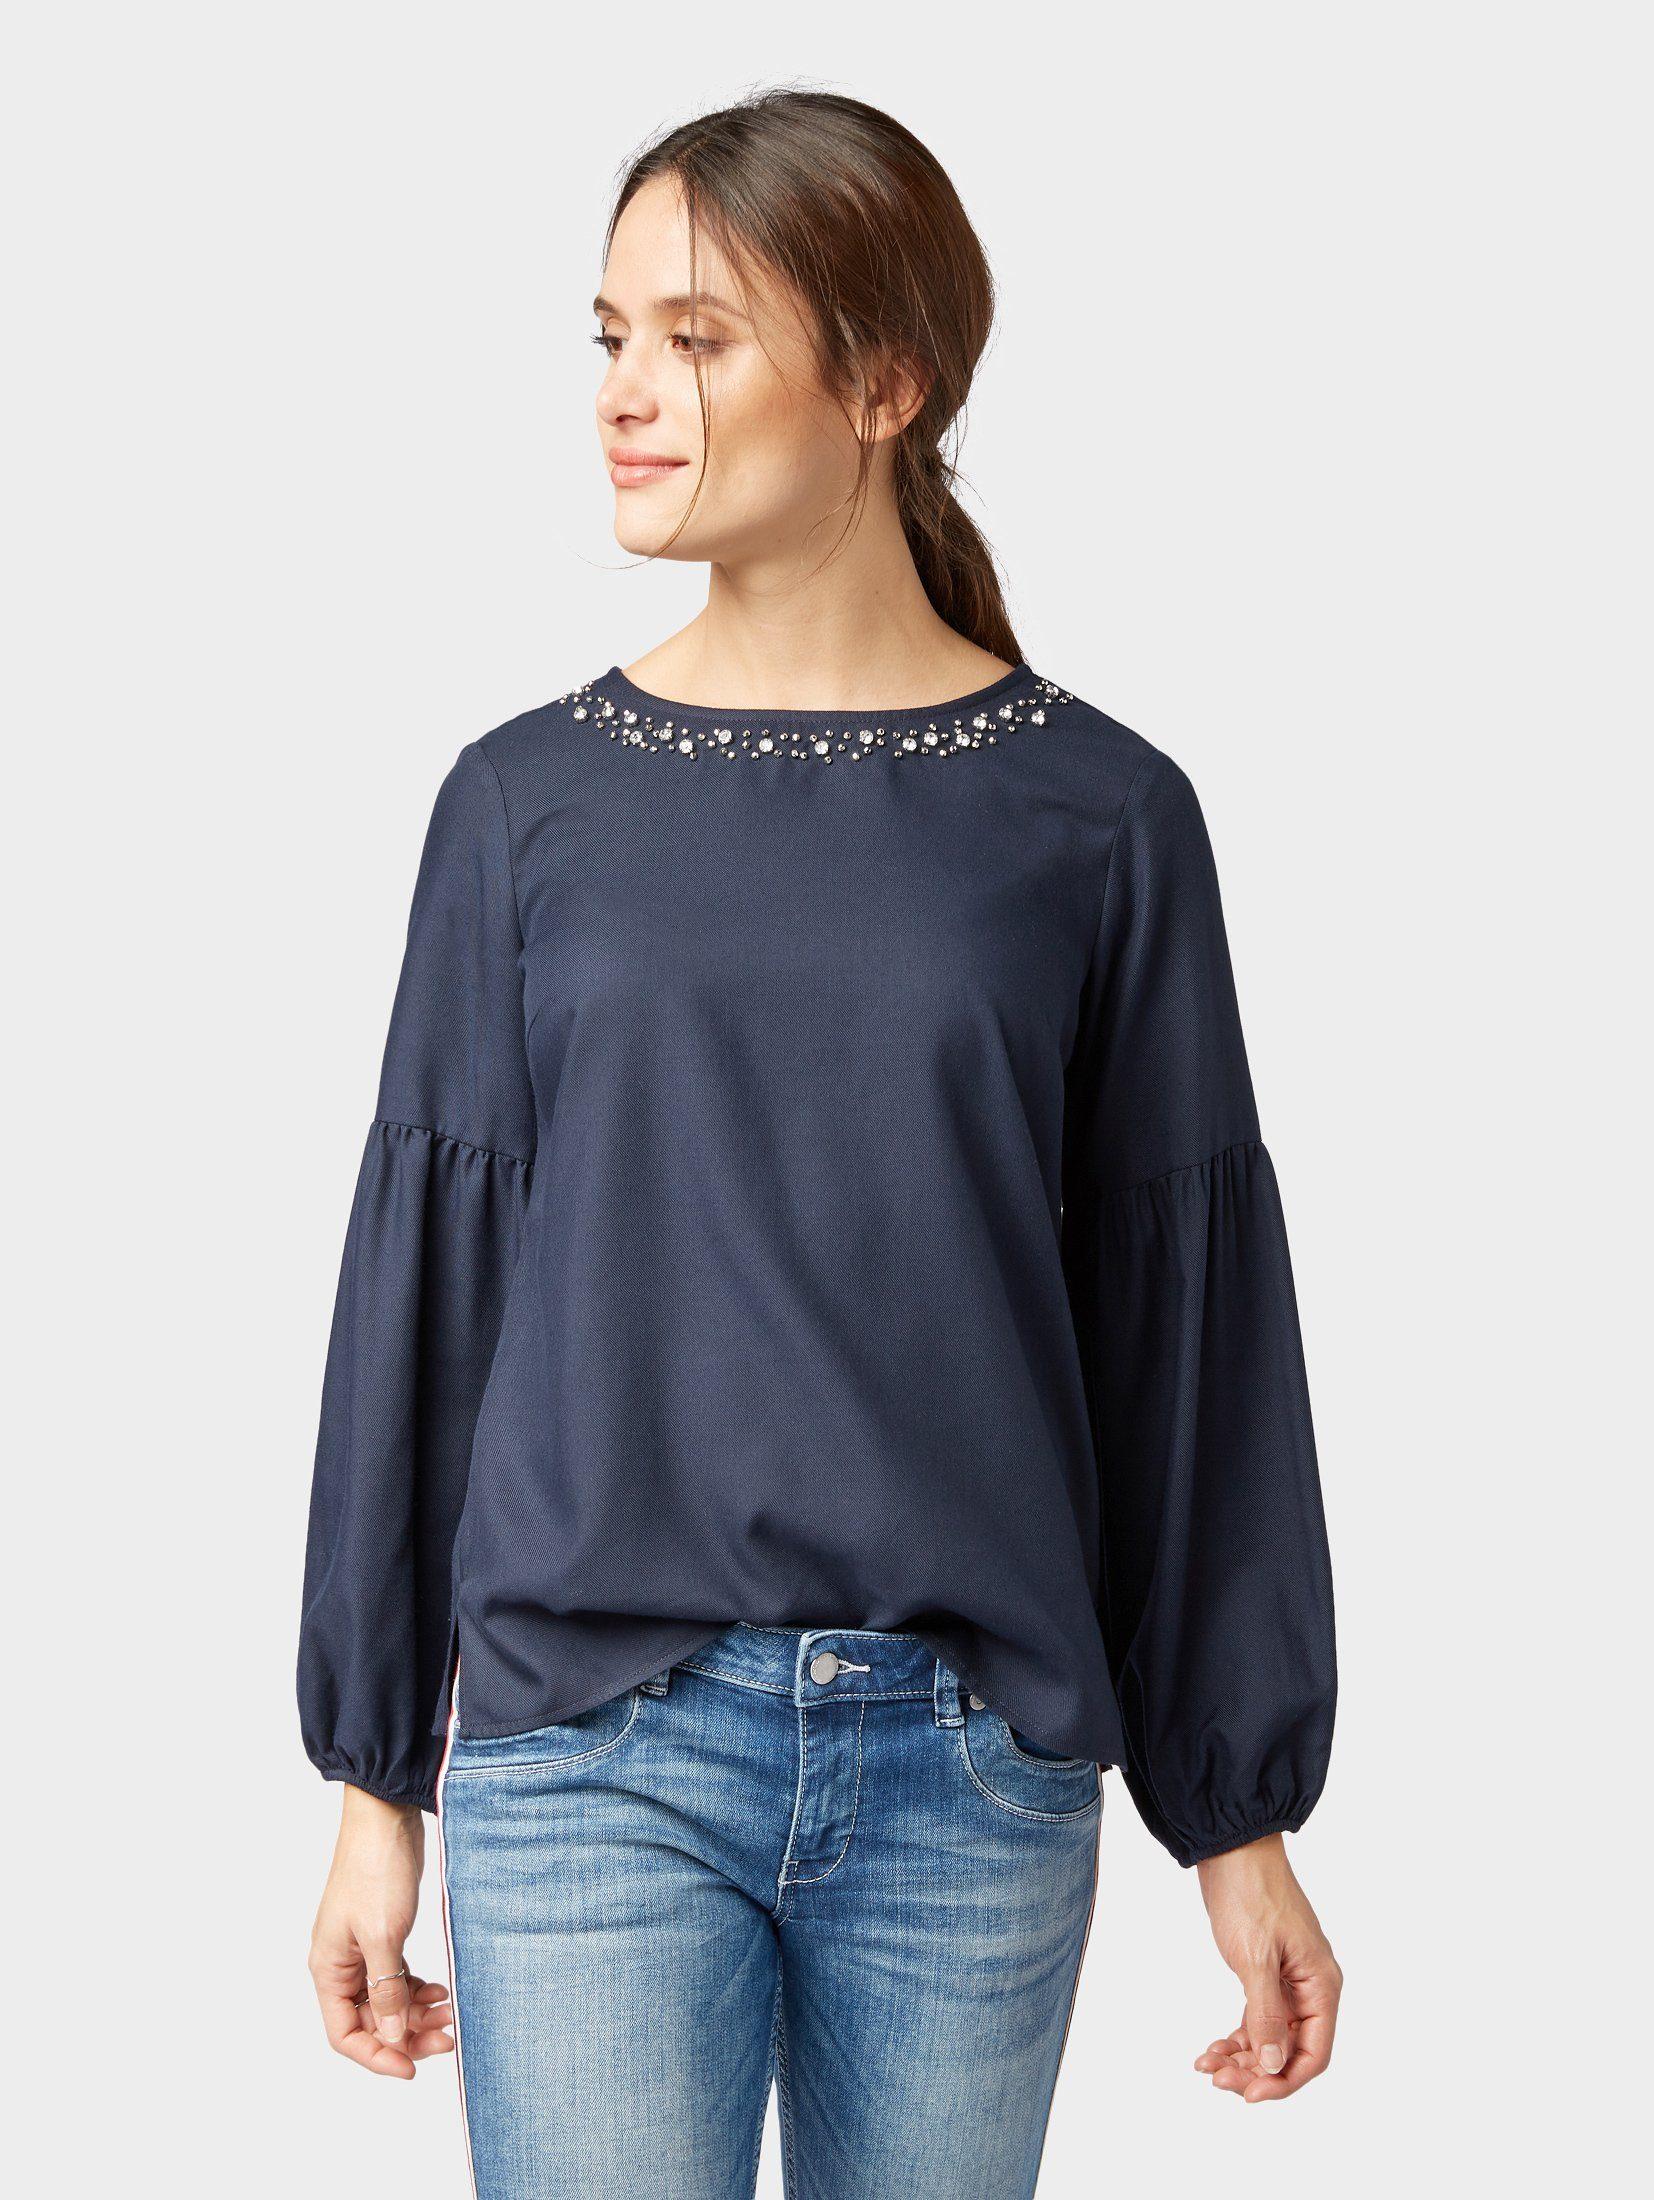 TOM TAILOR Shirtbluse »Bluse mit Perlen-Applikation«